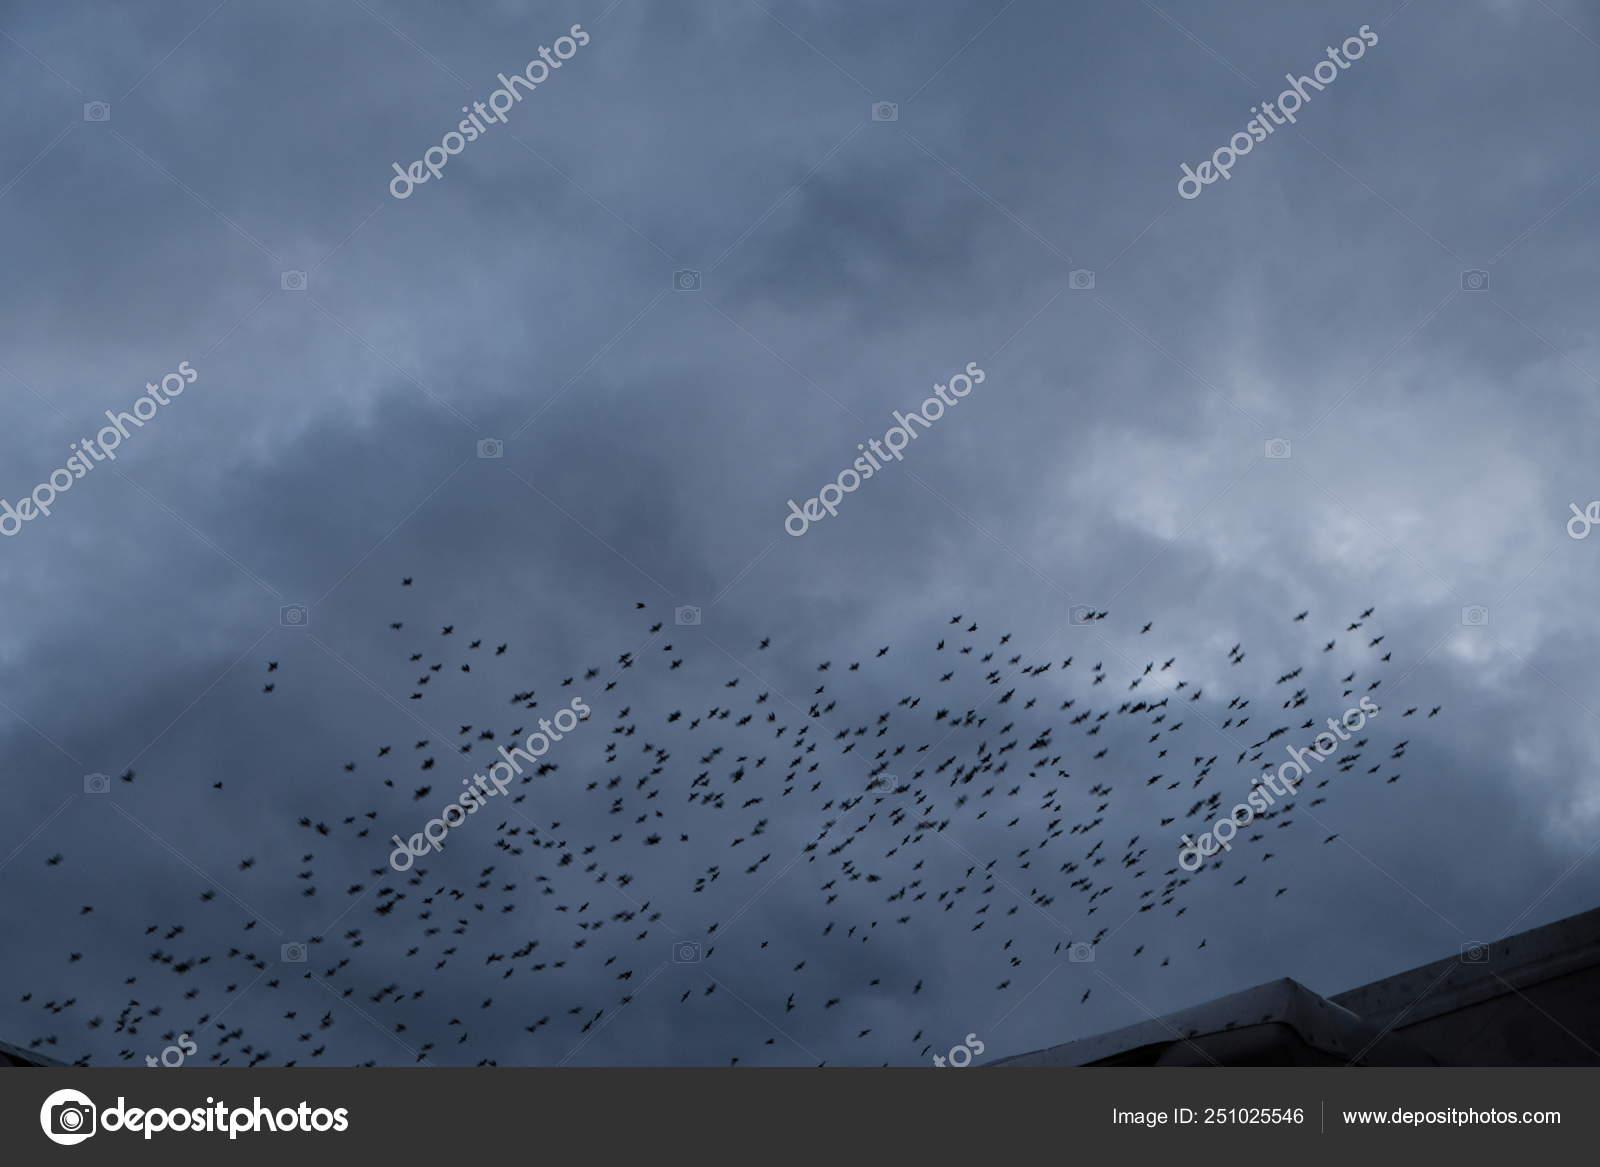 Skovrcy Vechrom Birds Fly At Night In The Birdhouses Nest Stock